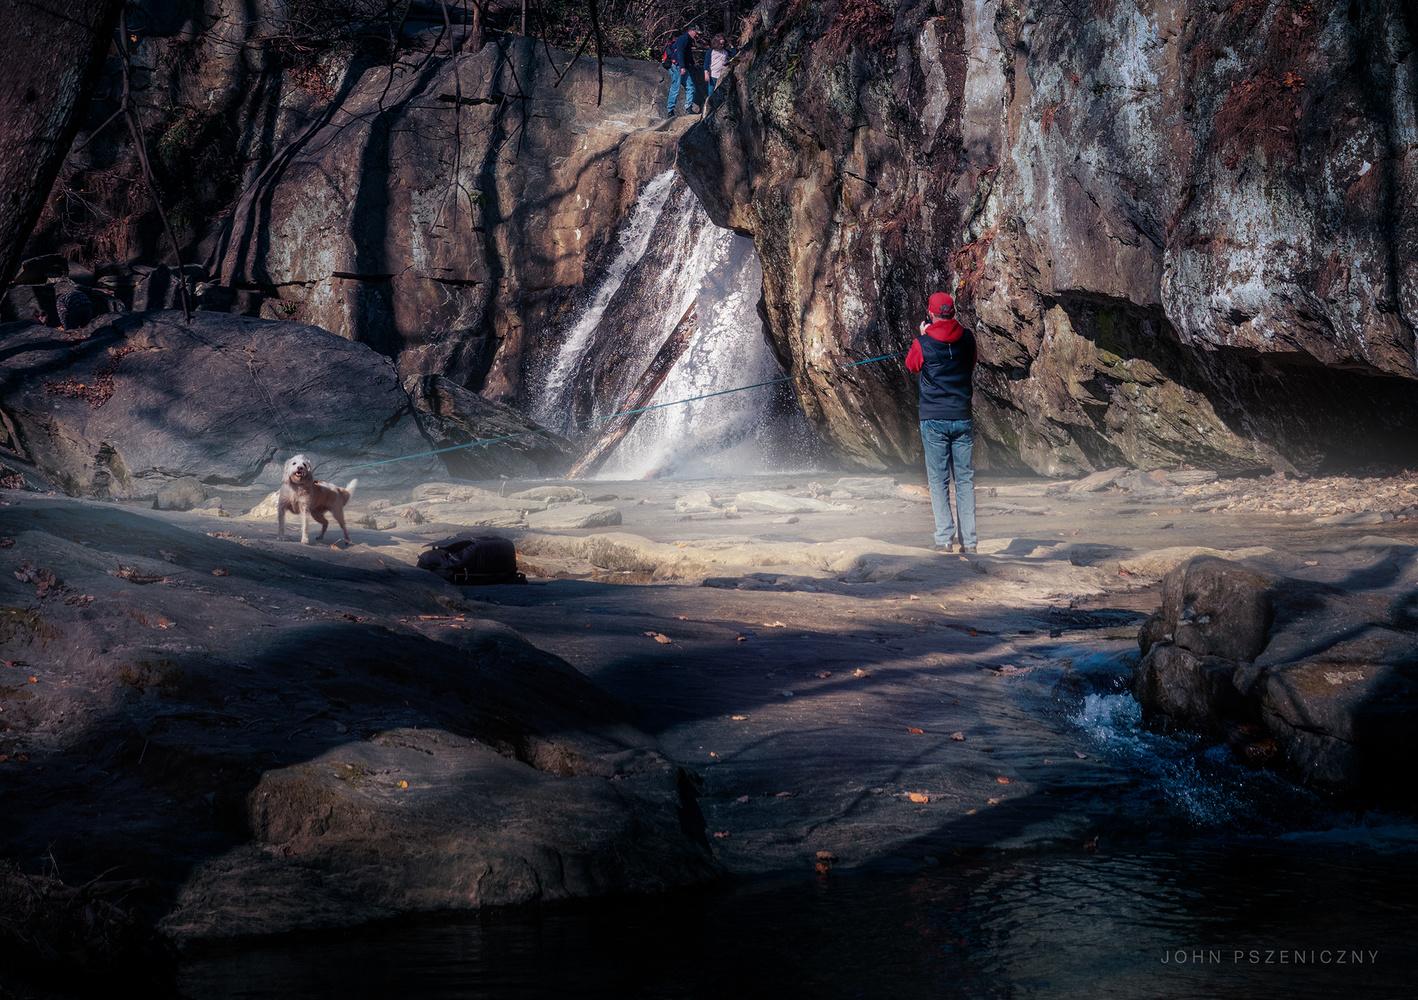 Kilgore Falls by John Pszeniczny